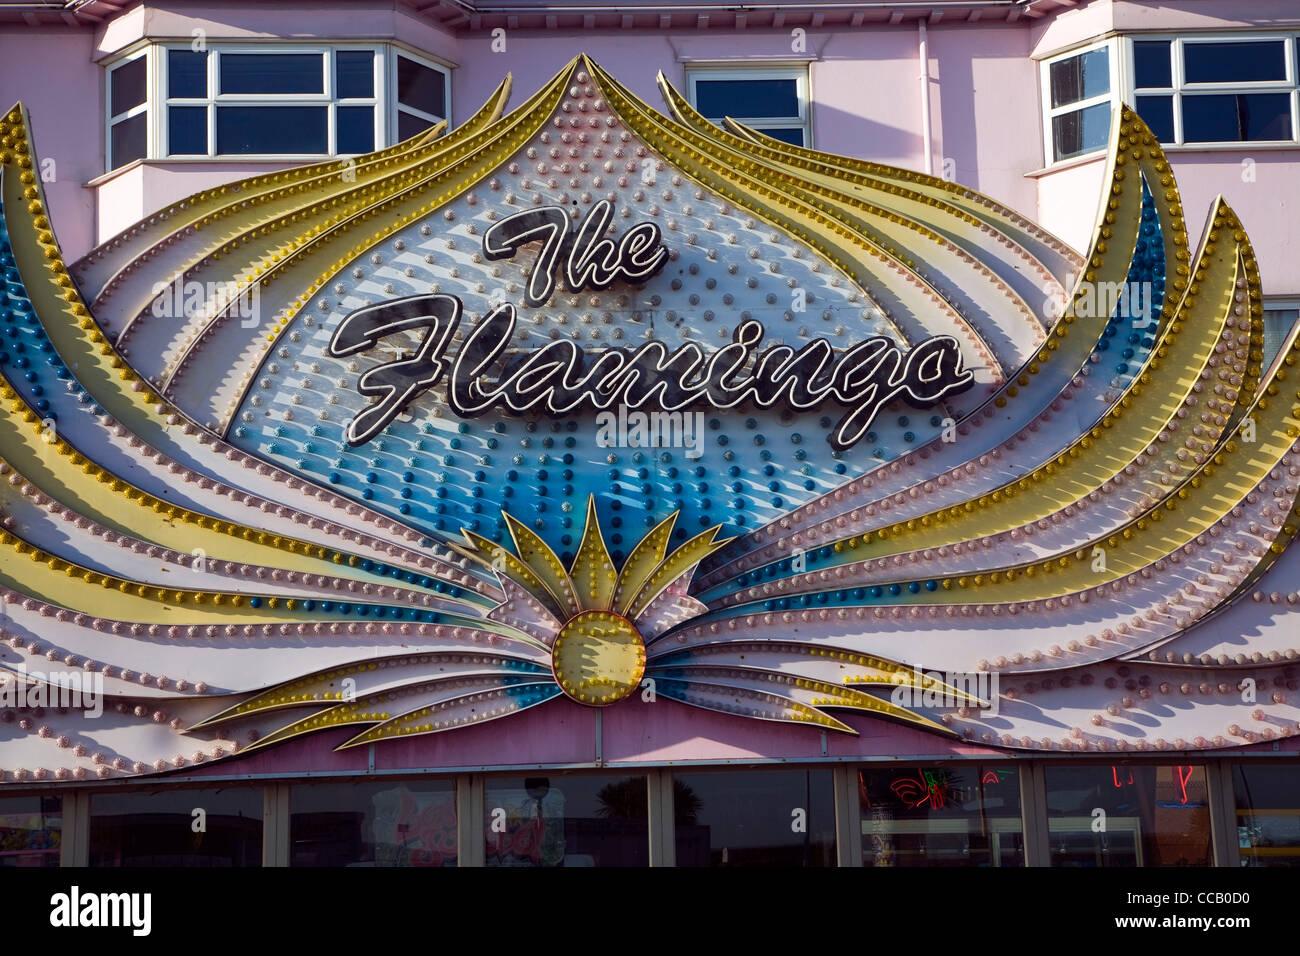 The Flamingo amusements Great Yarmouth - Stock Image